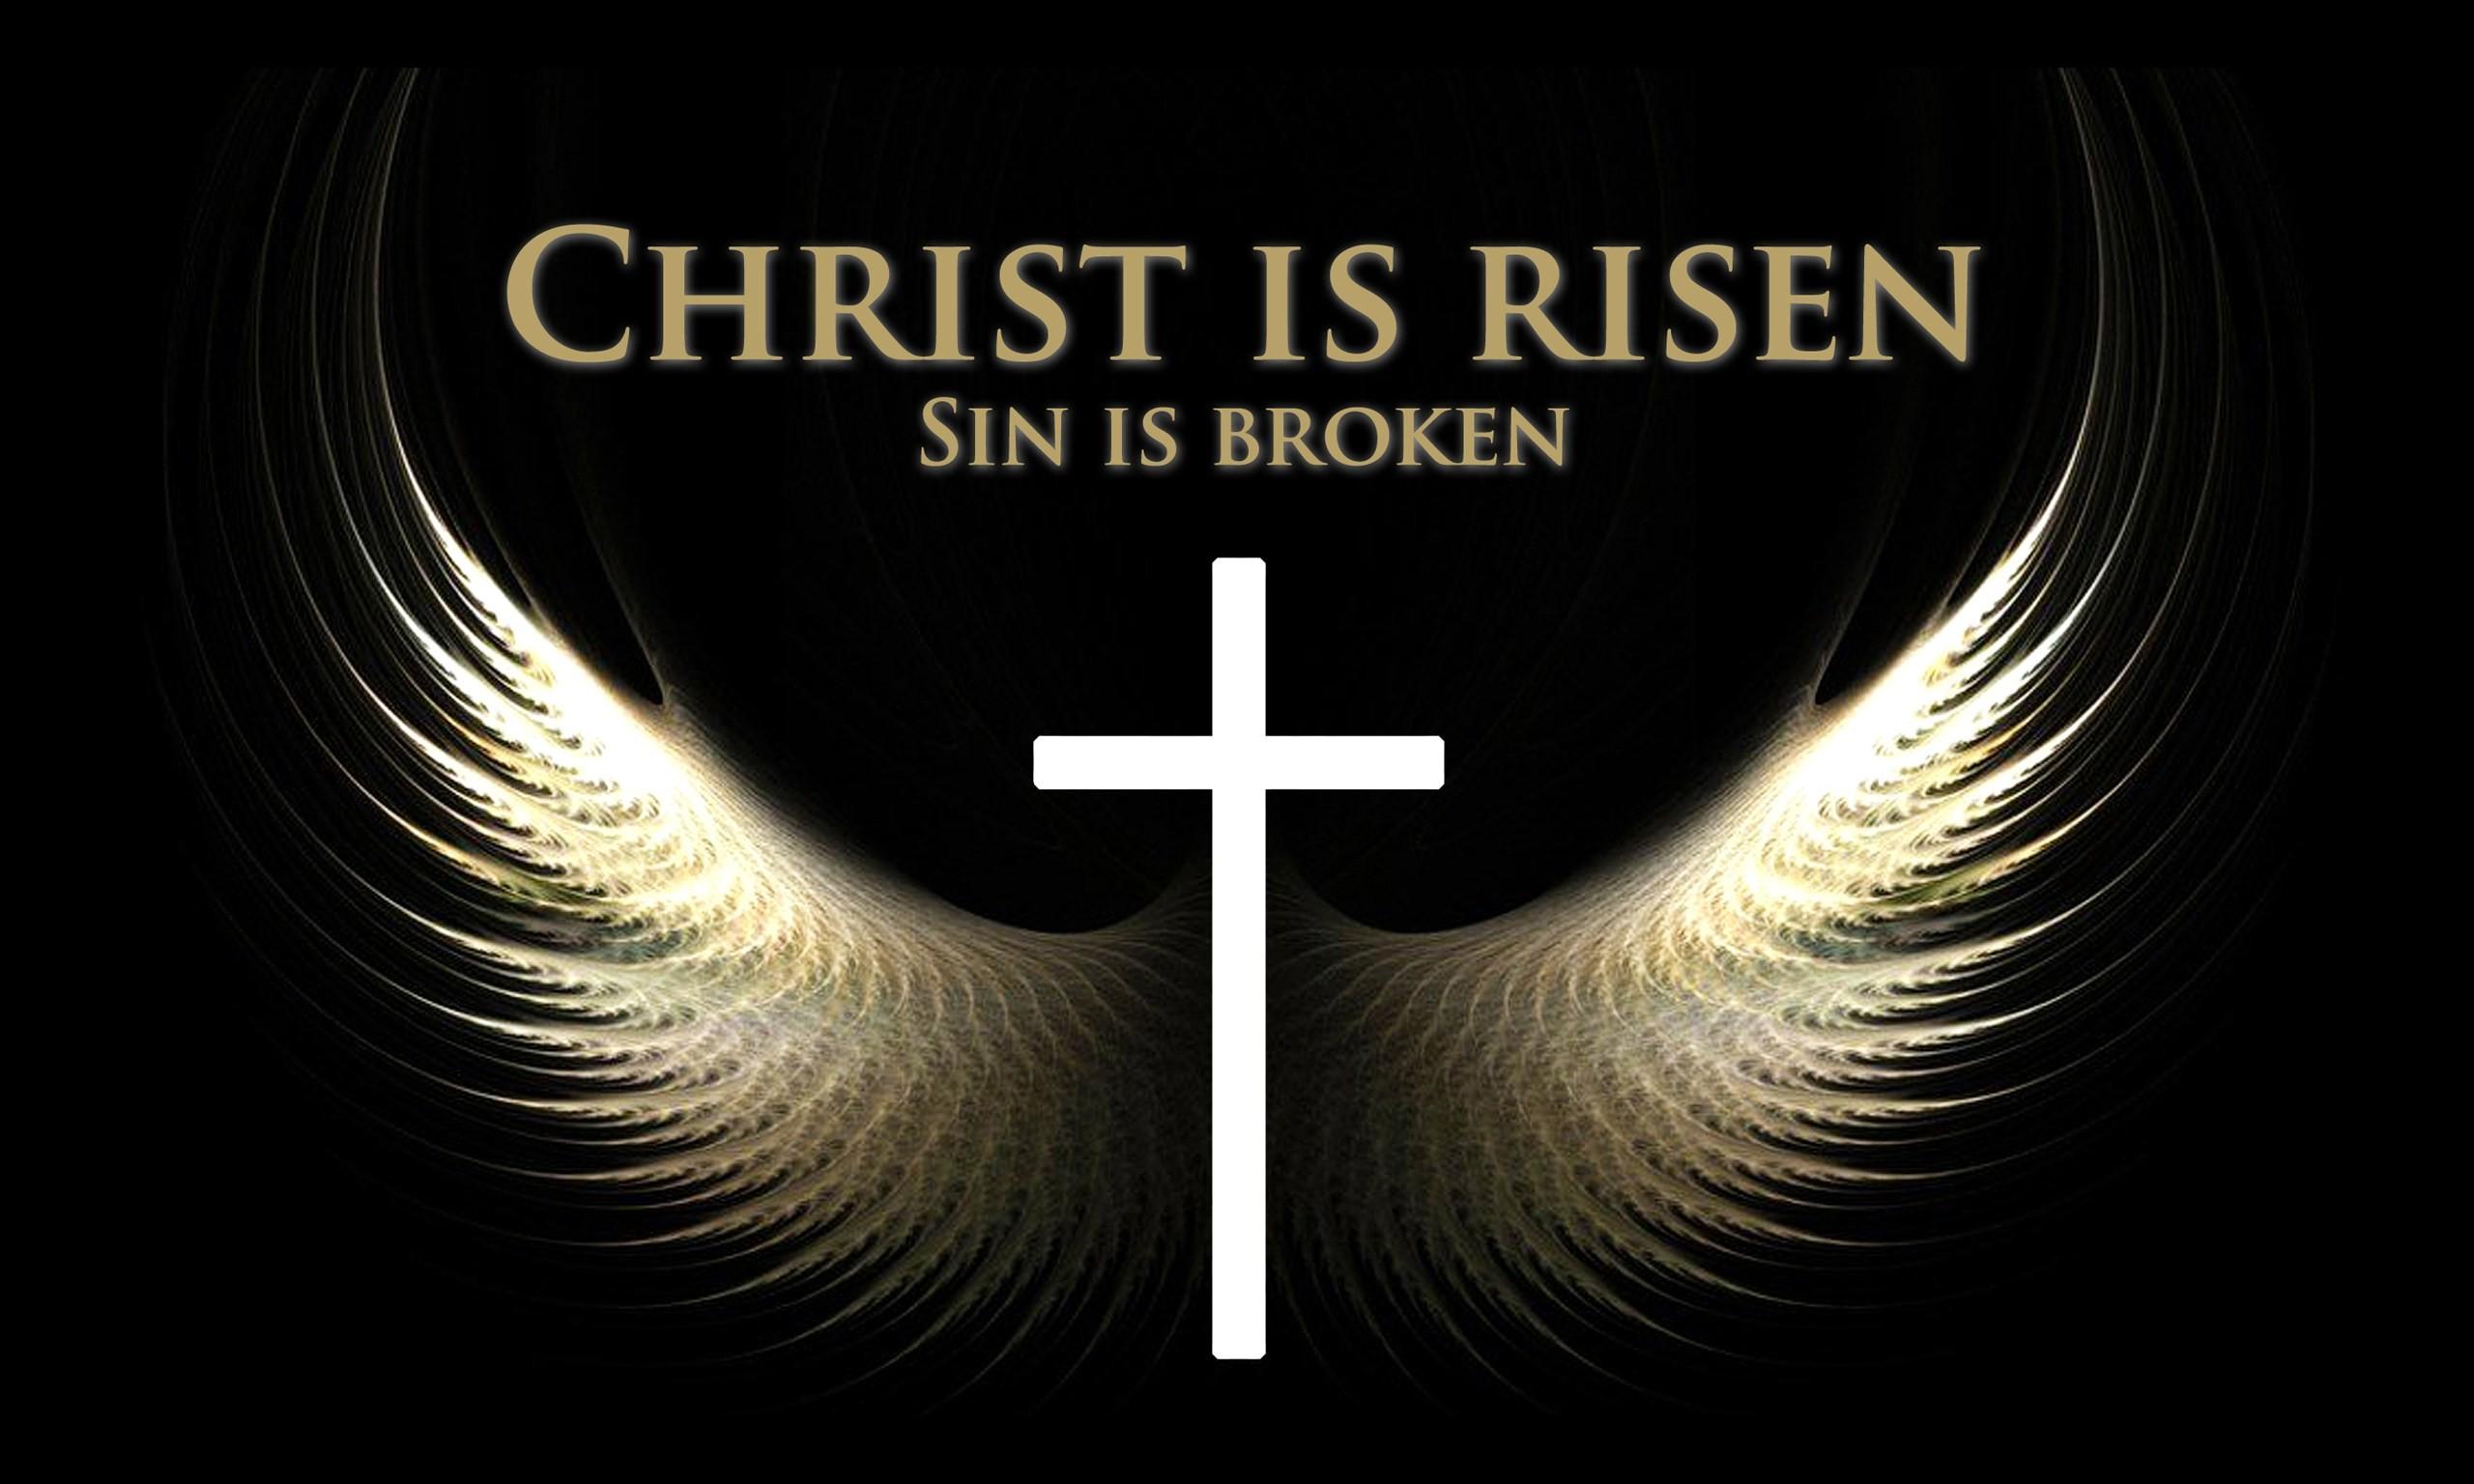 URL: https://motherday2014.com/tags/christian .